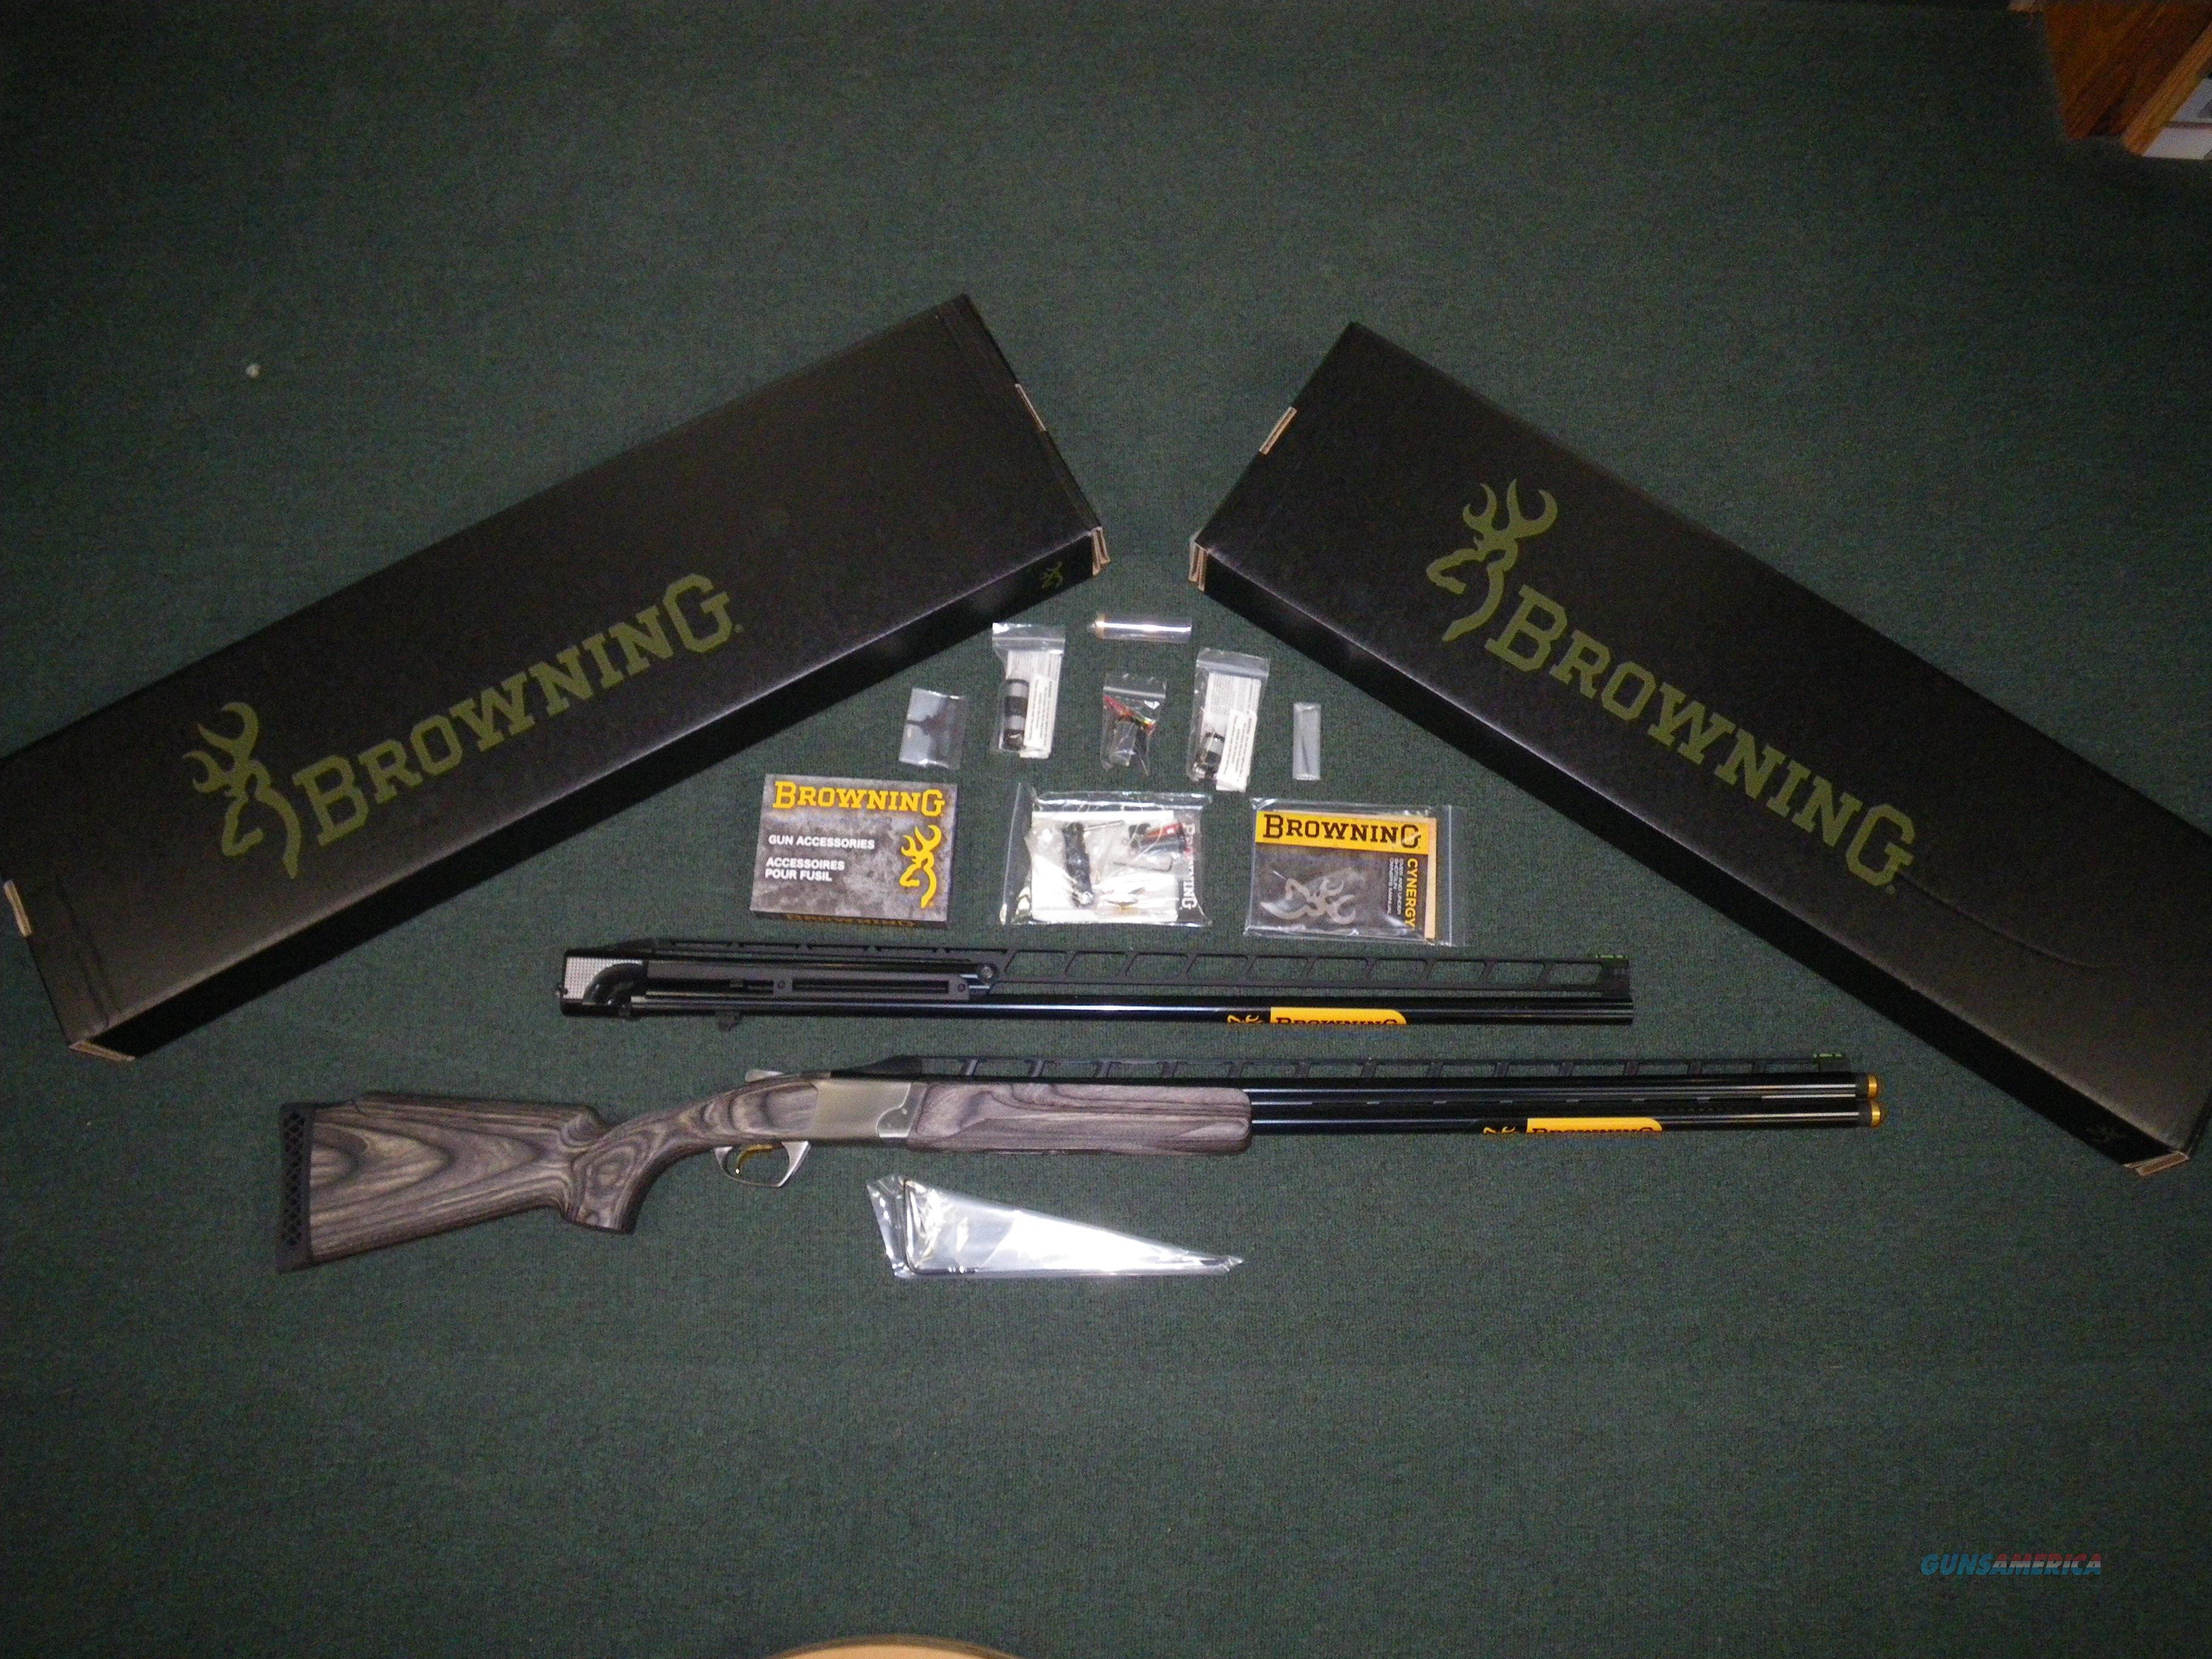 "Browning Cynergy Trap Unsingle Combo 12ga 30""/34"" #018707468  Guns > Shotguns > Browning Shotguns > Over Unders > Cynergy > Hunting"